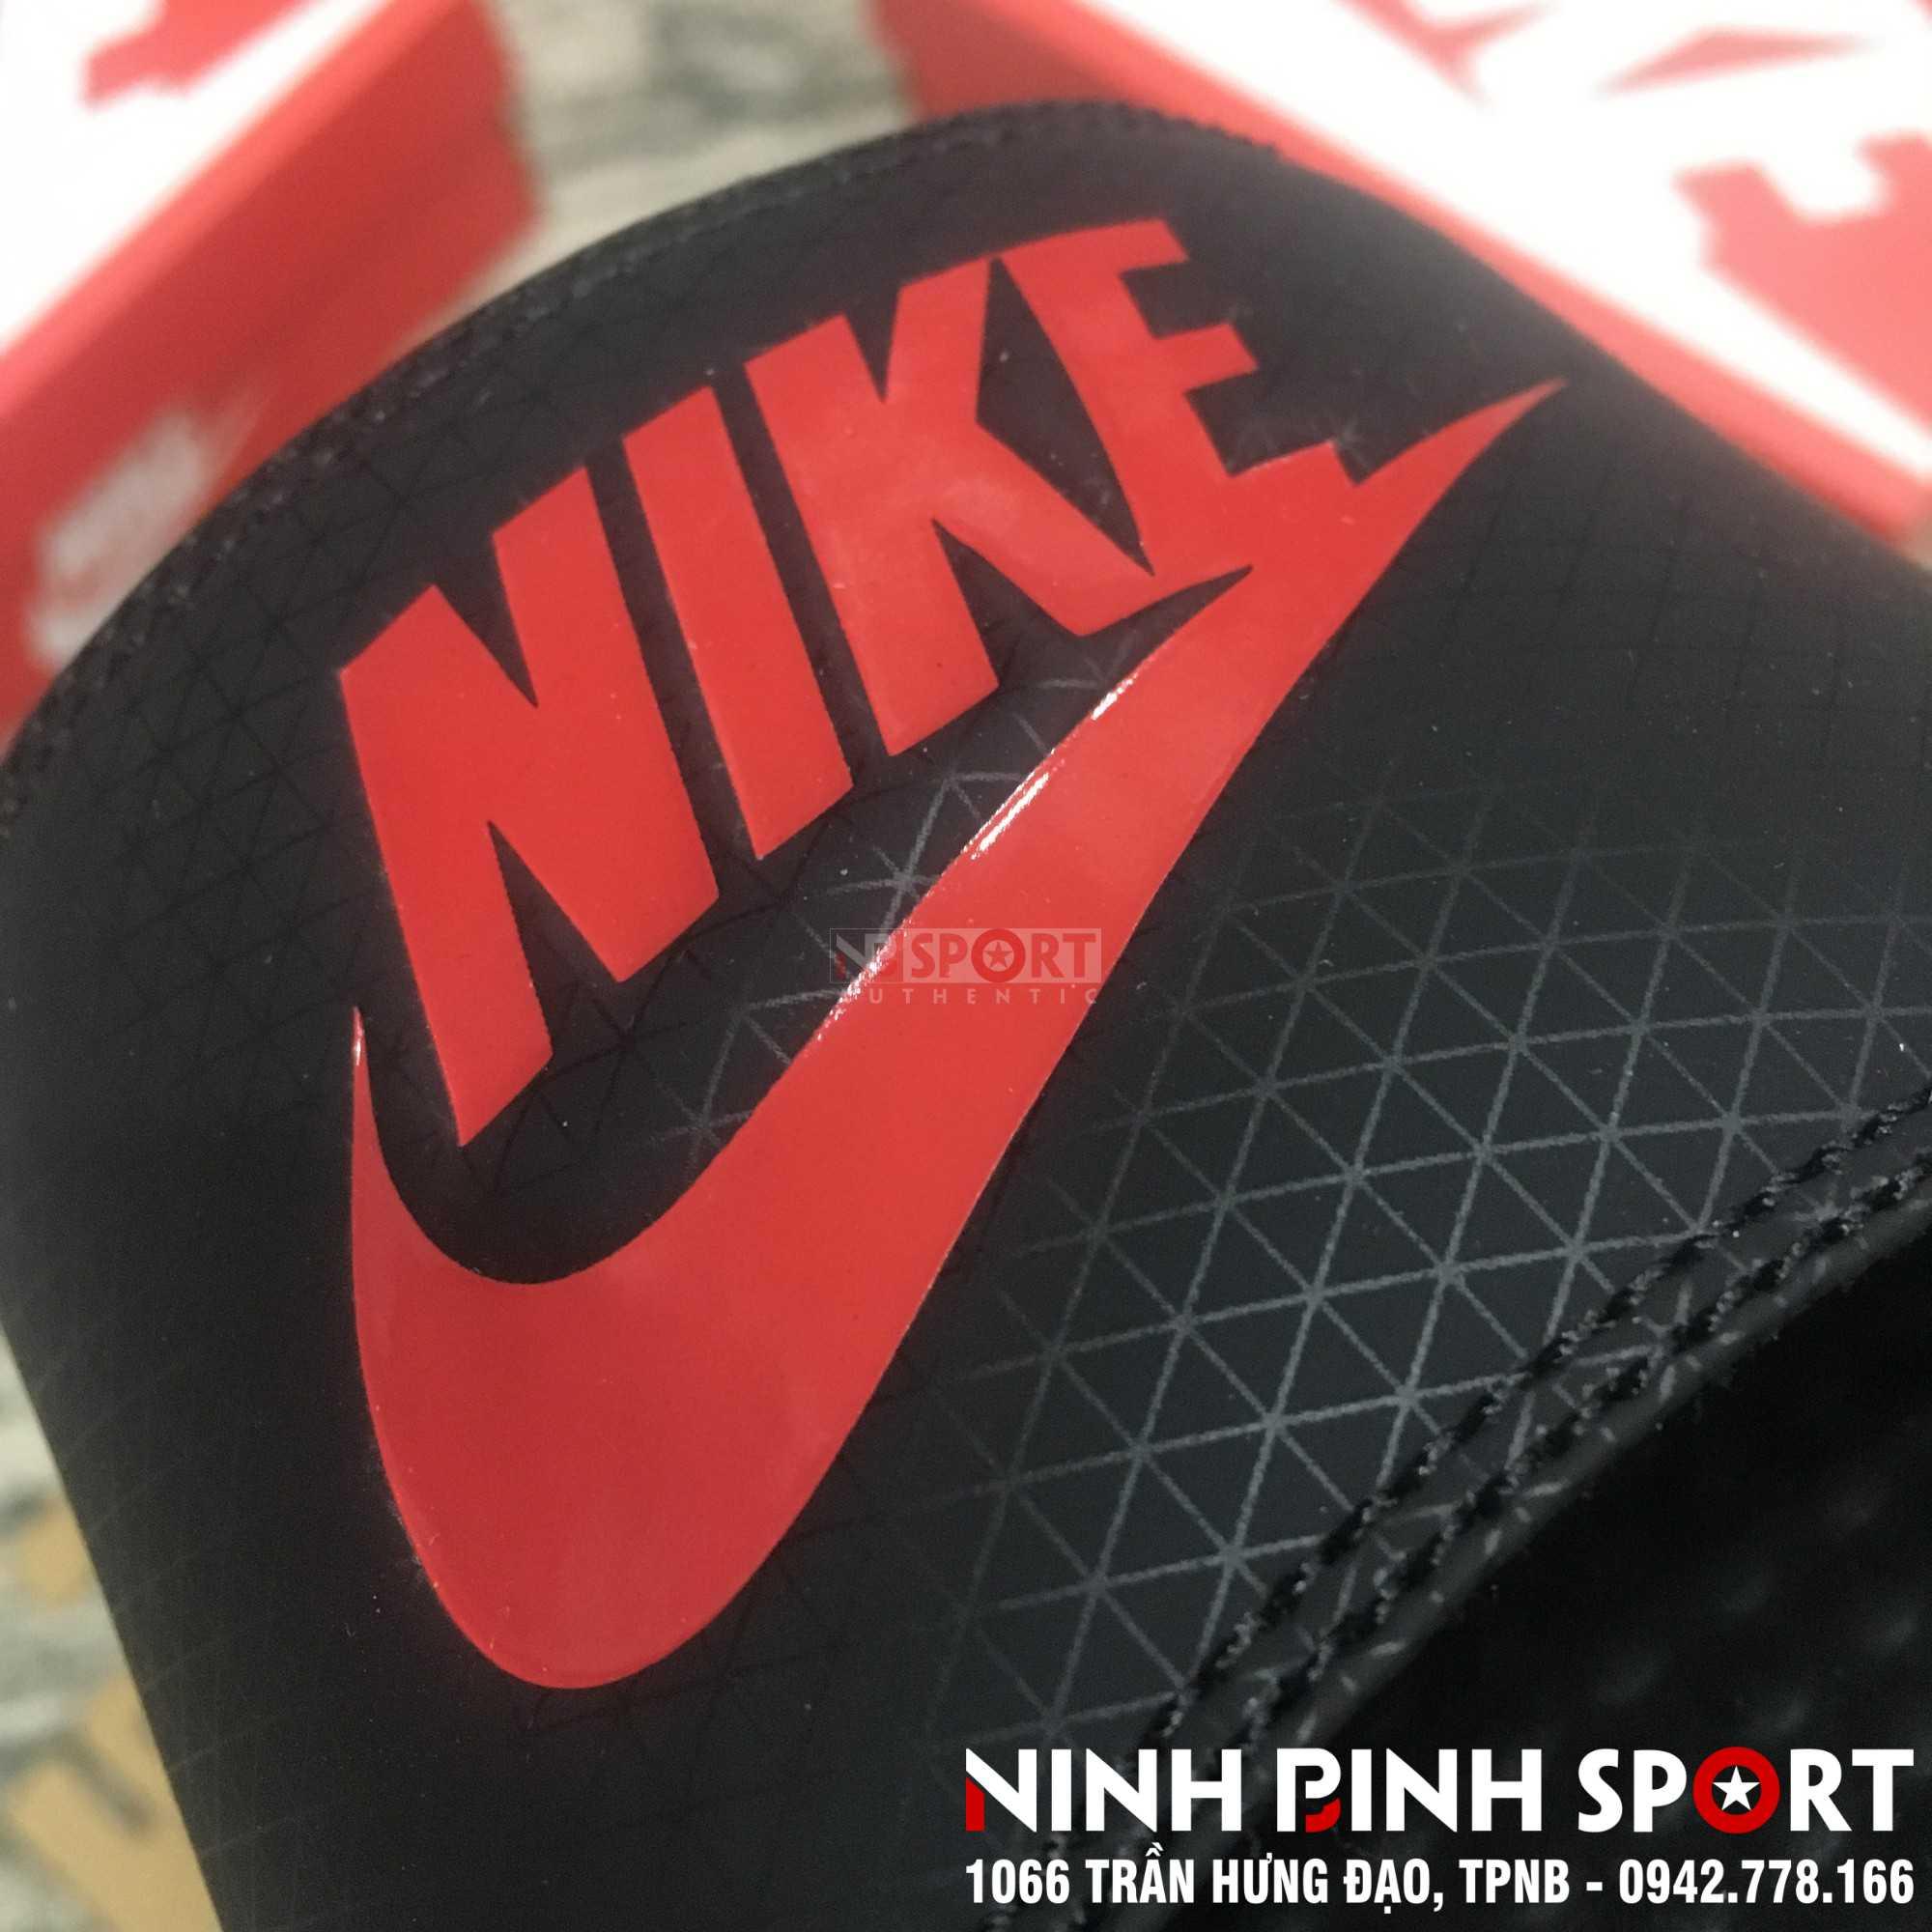 Dép thể thao nam Nike Benassi JDI Slide Black/red 343880-060